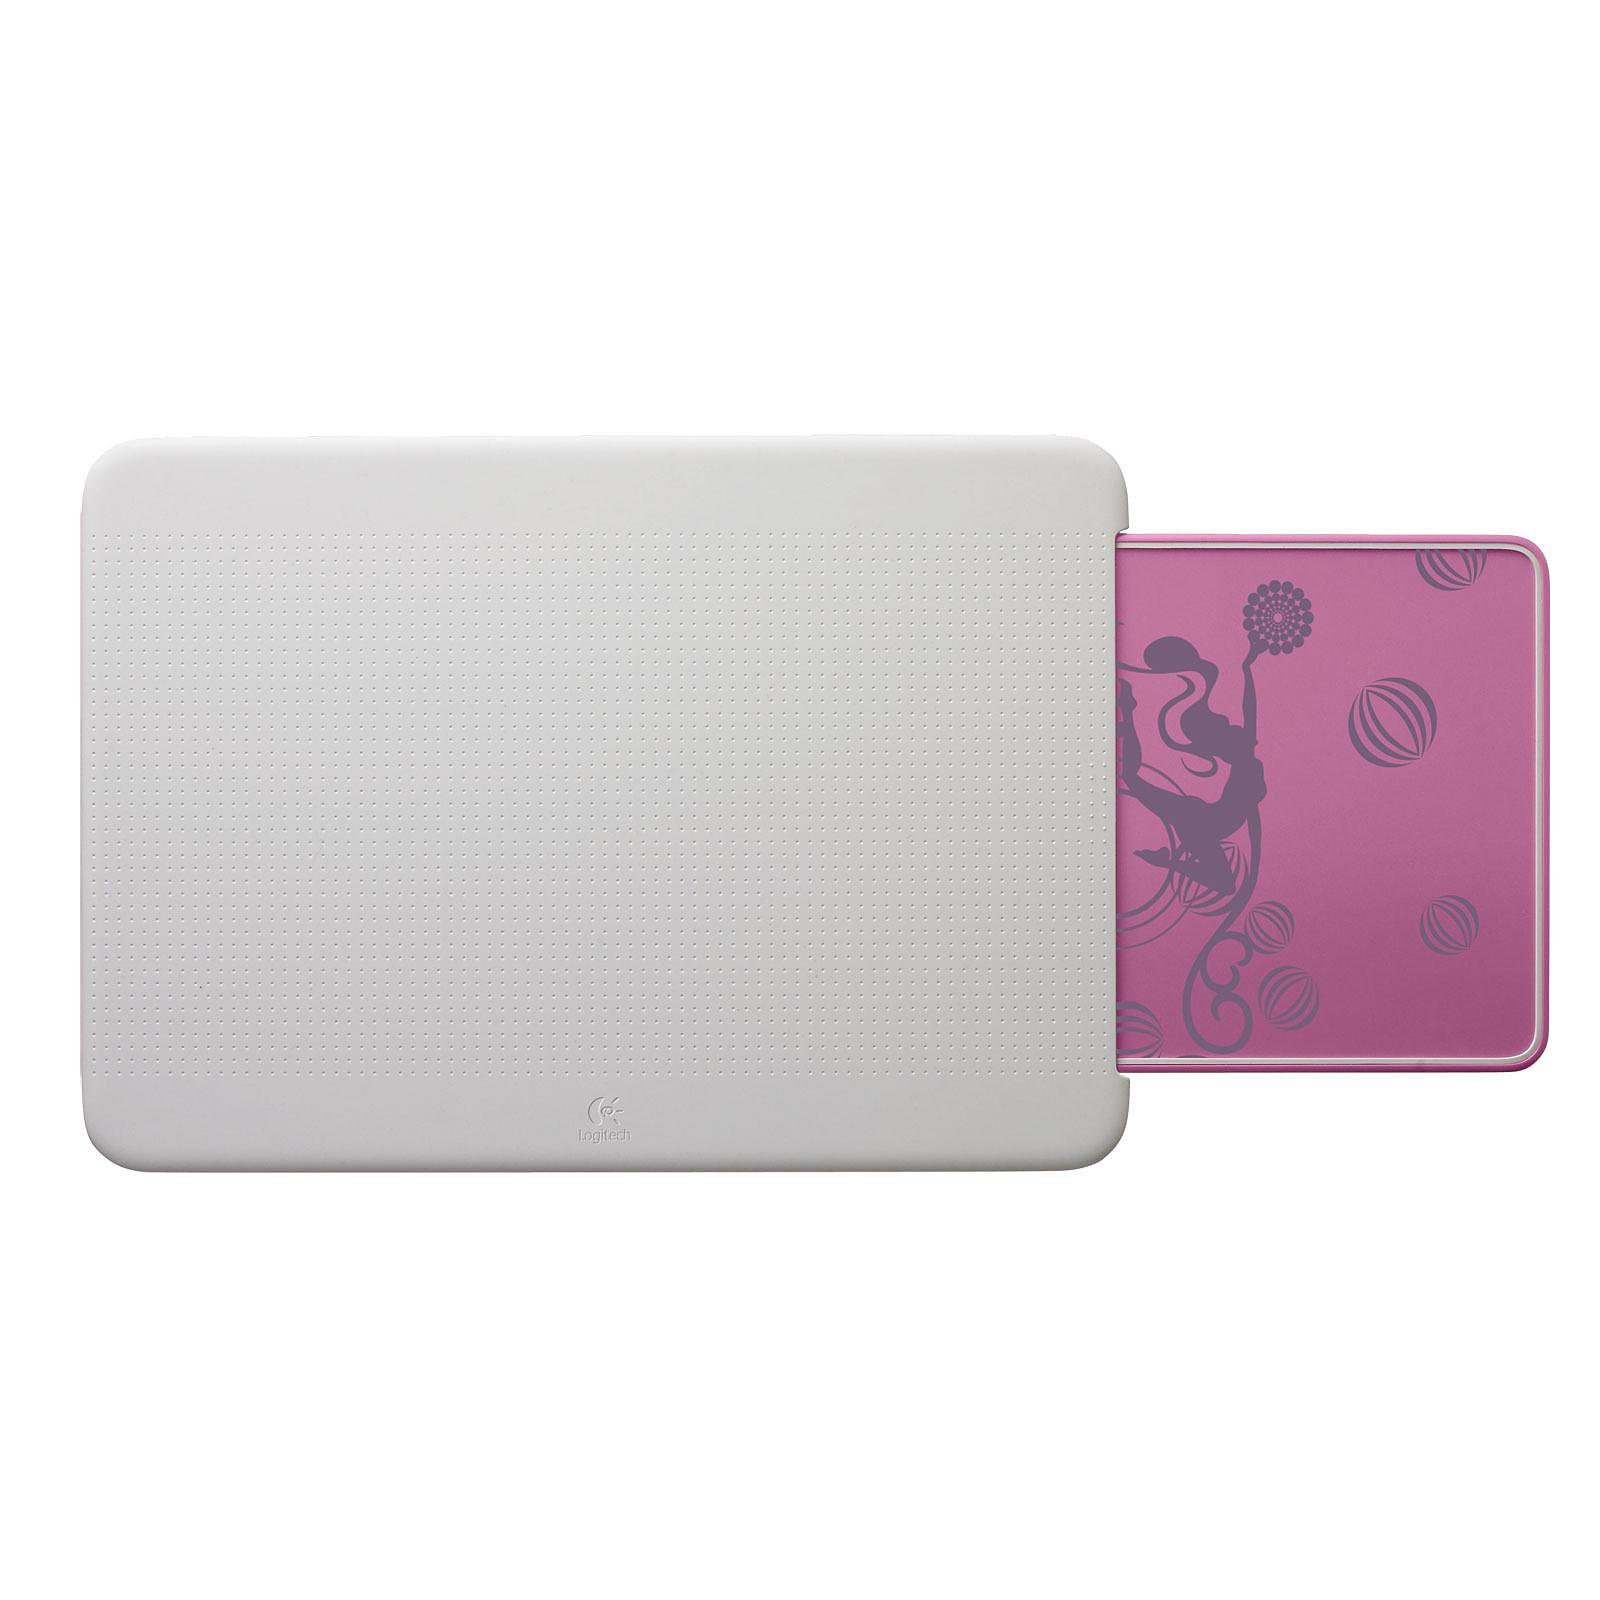 Logitech Portable Lapdesk N315 Blanc/Rose